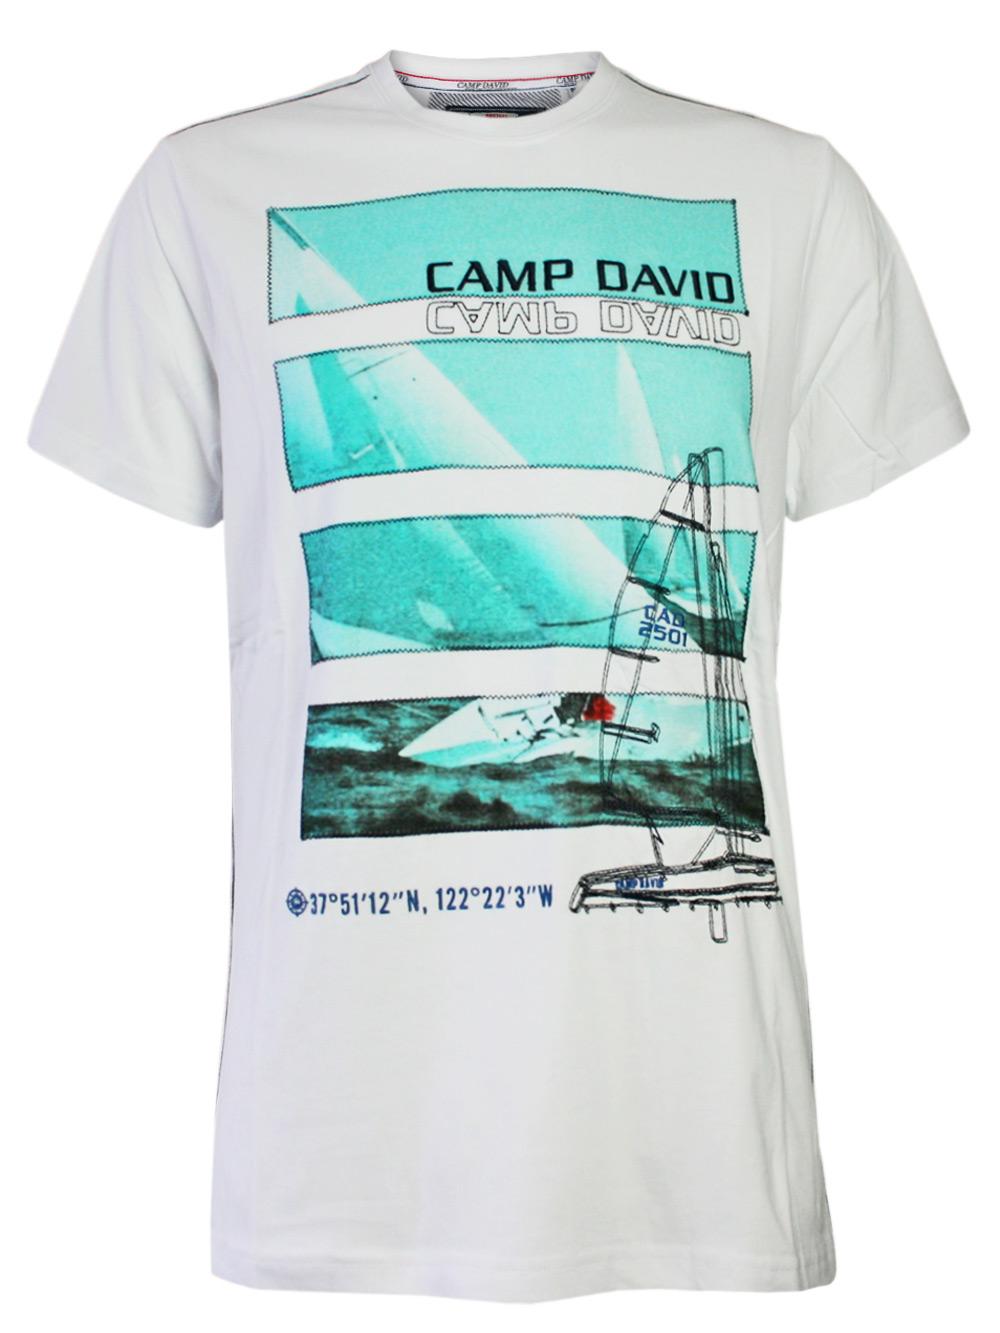 edles camp david herren t shirt sailing cup 3 in wei neu ebay. Black Bedroom Furniture Sets. Home Design Ideas